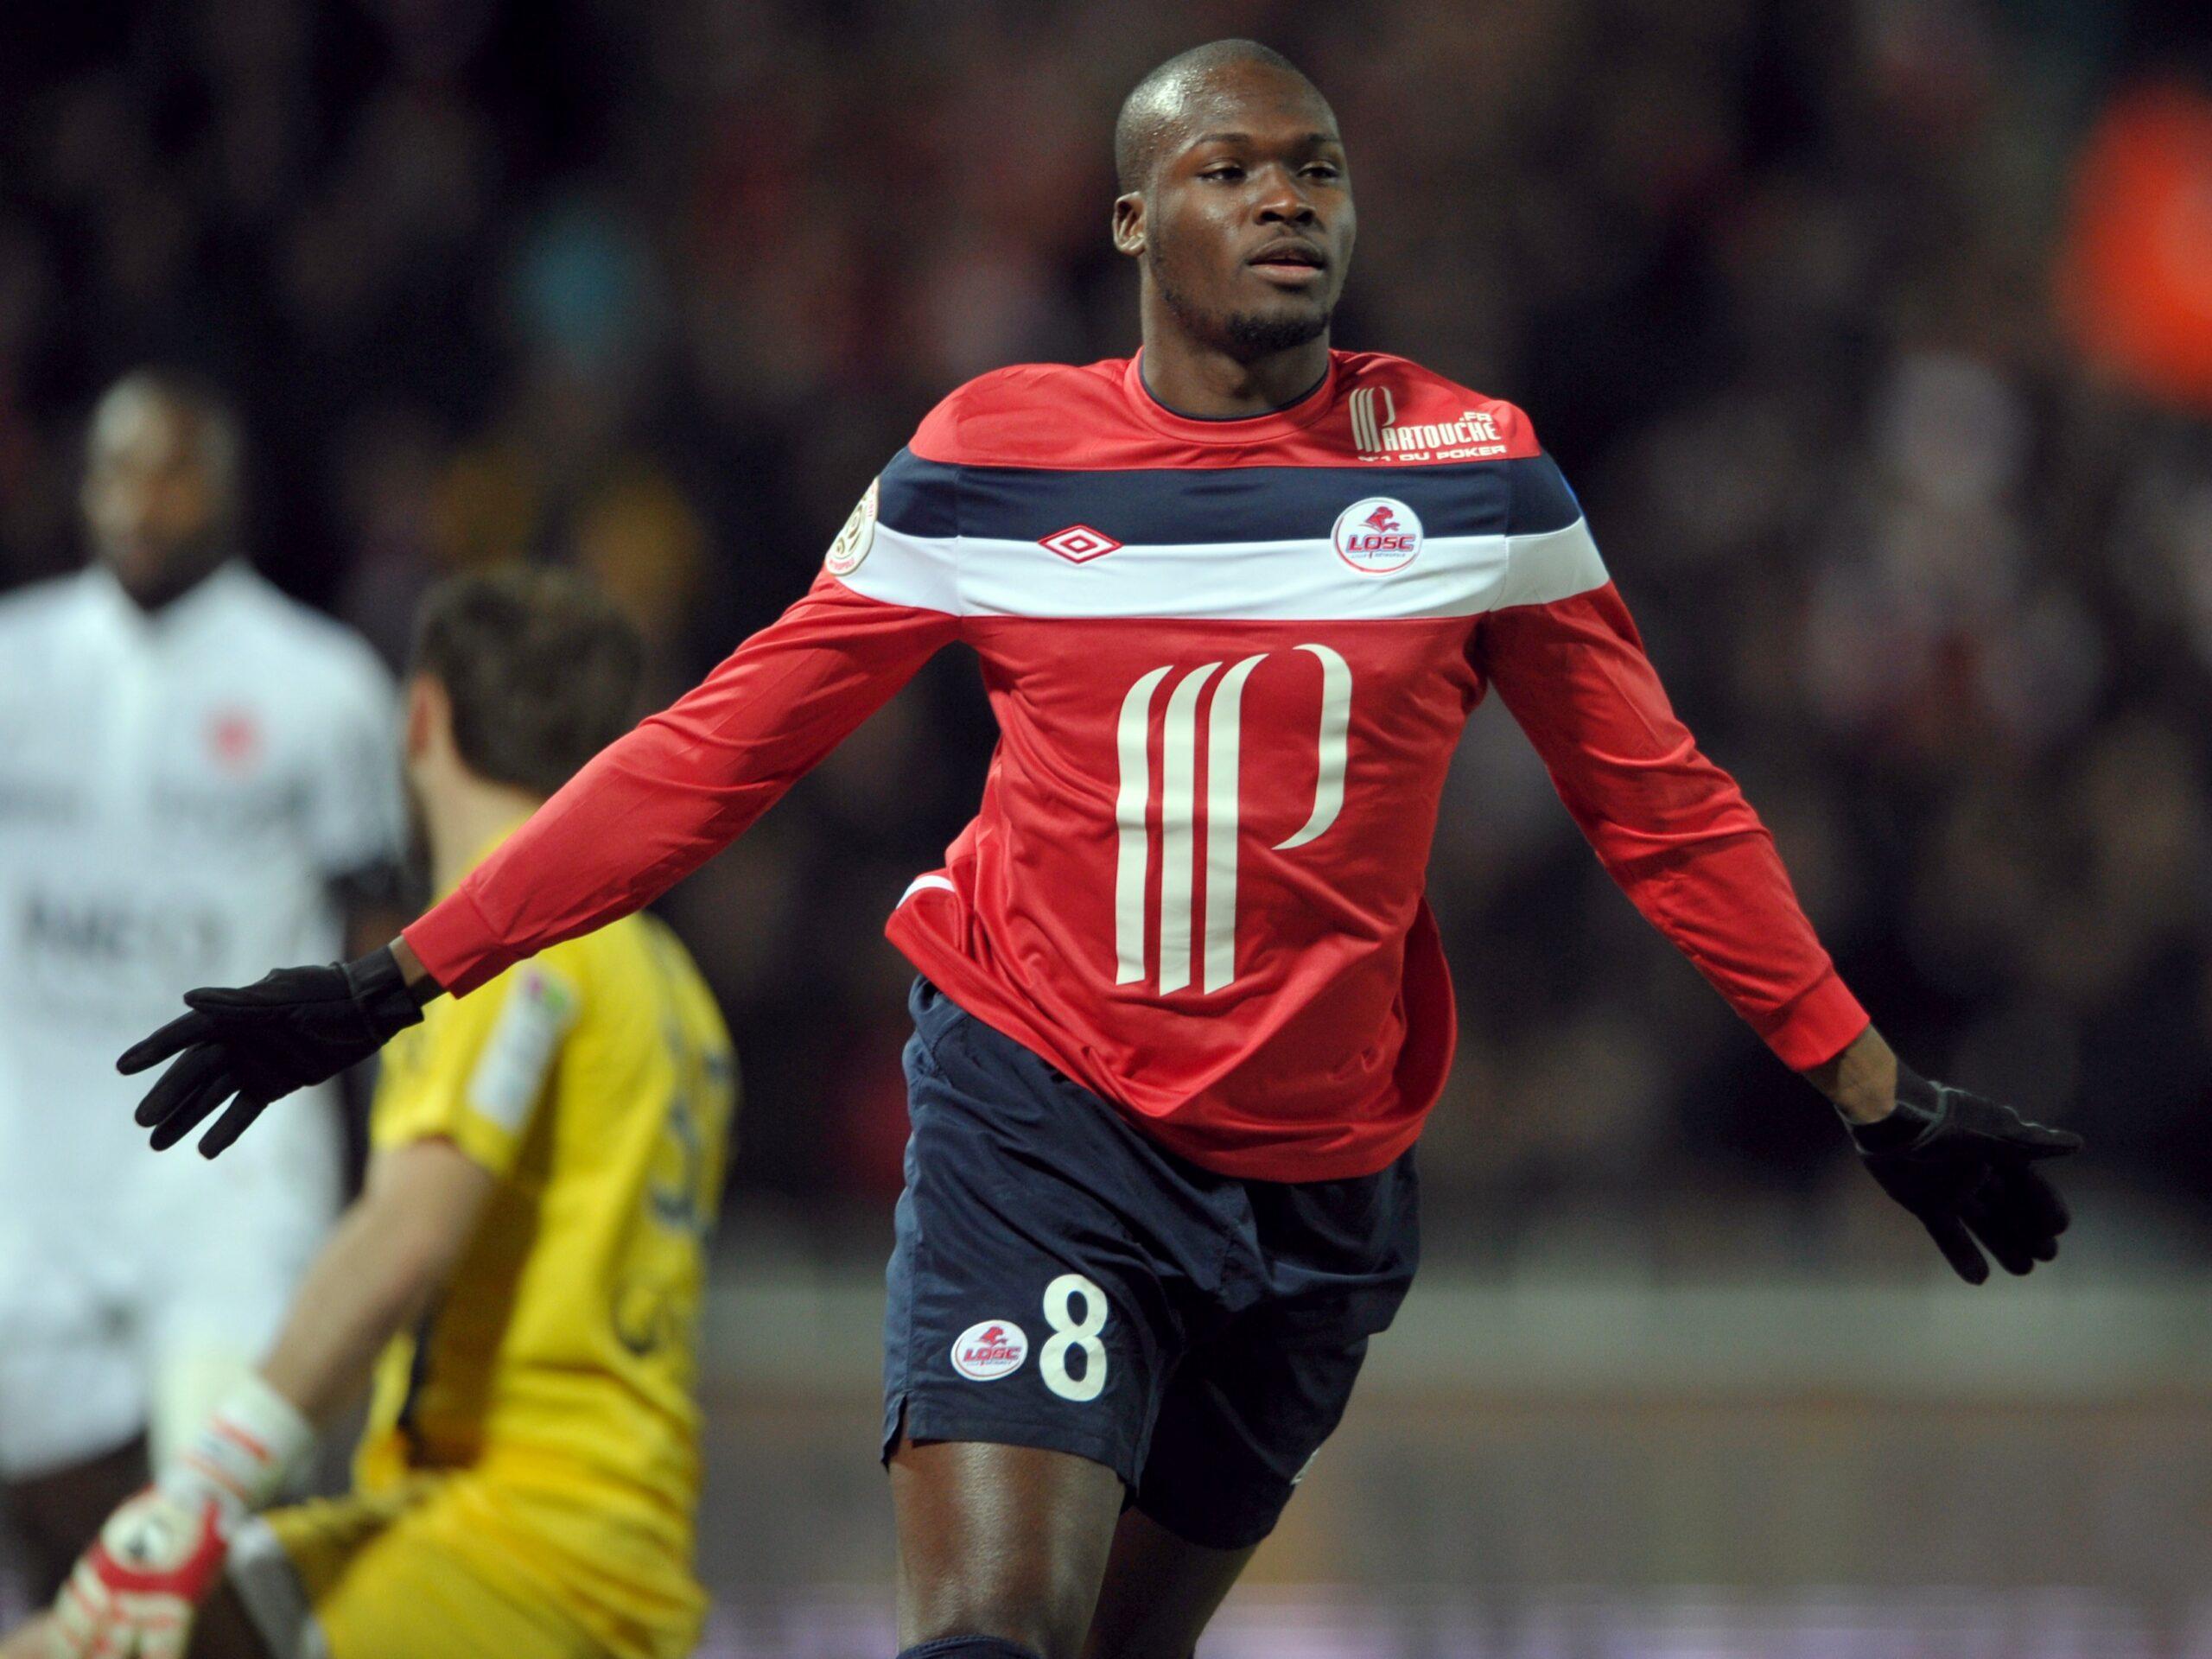 Lilles-Senegalese-forward-Moussa-Sow-ce-1585071134.jpg